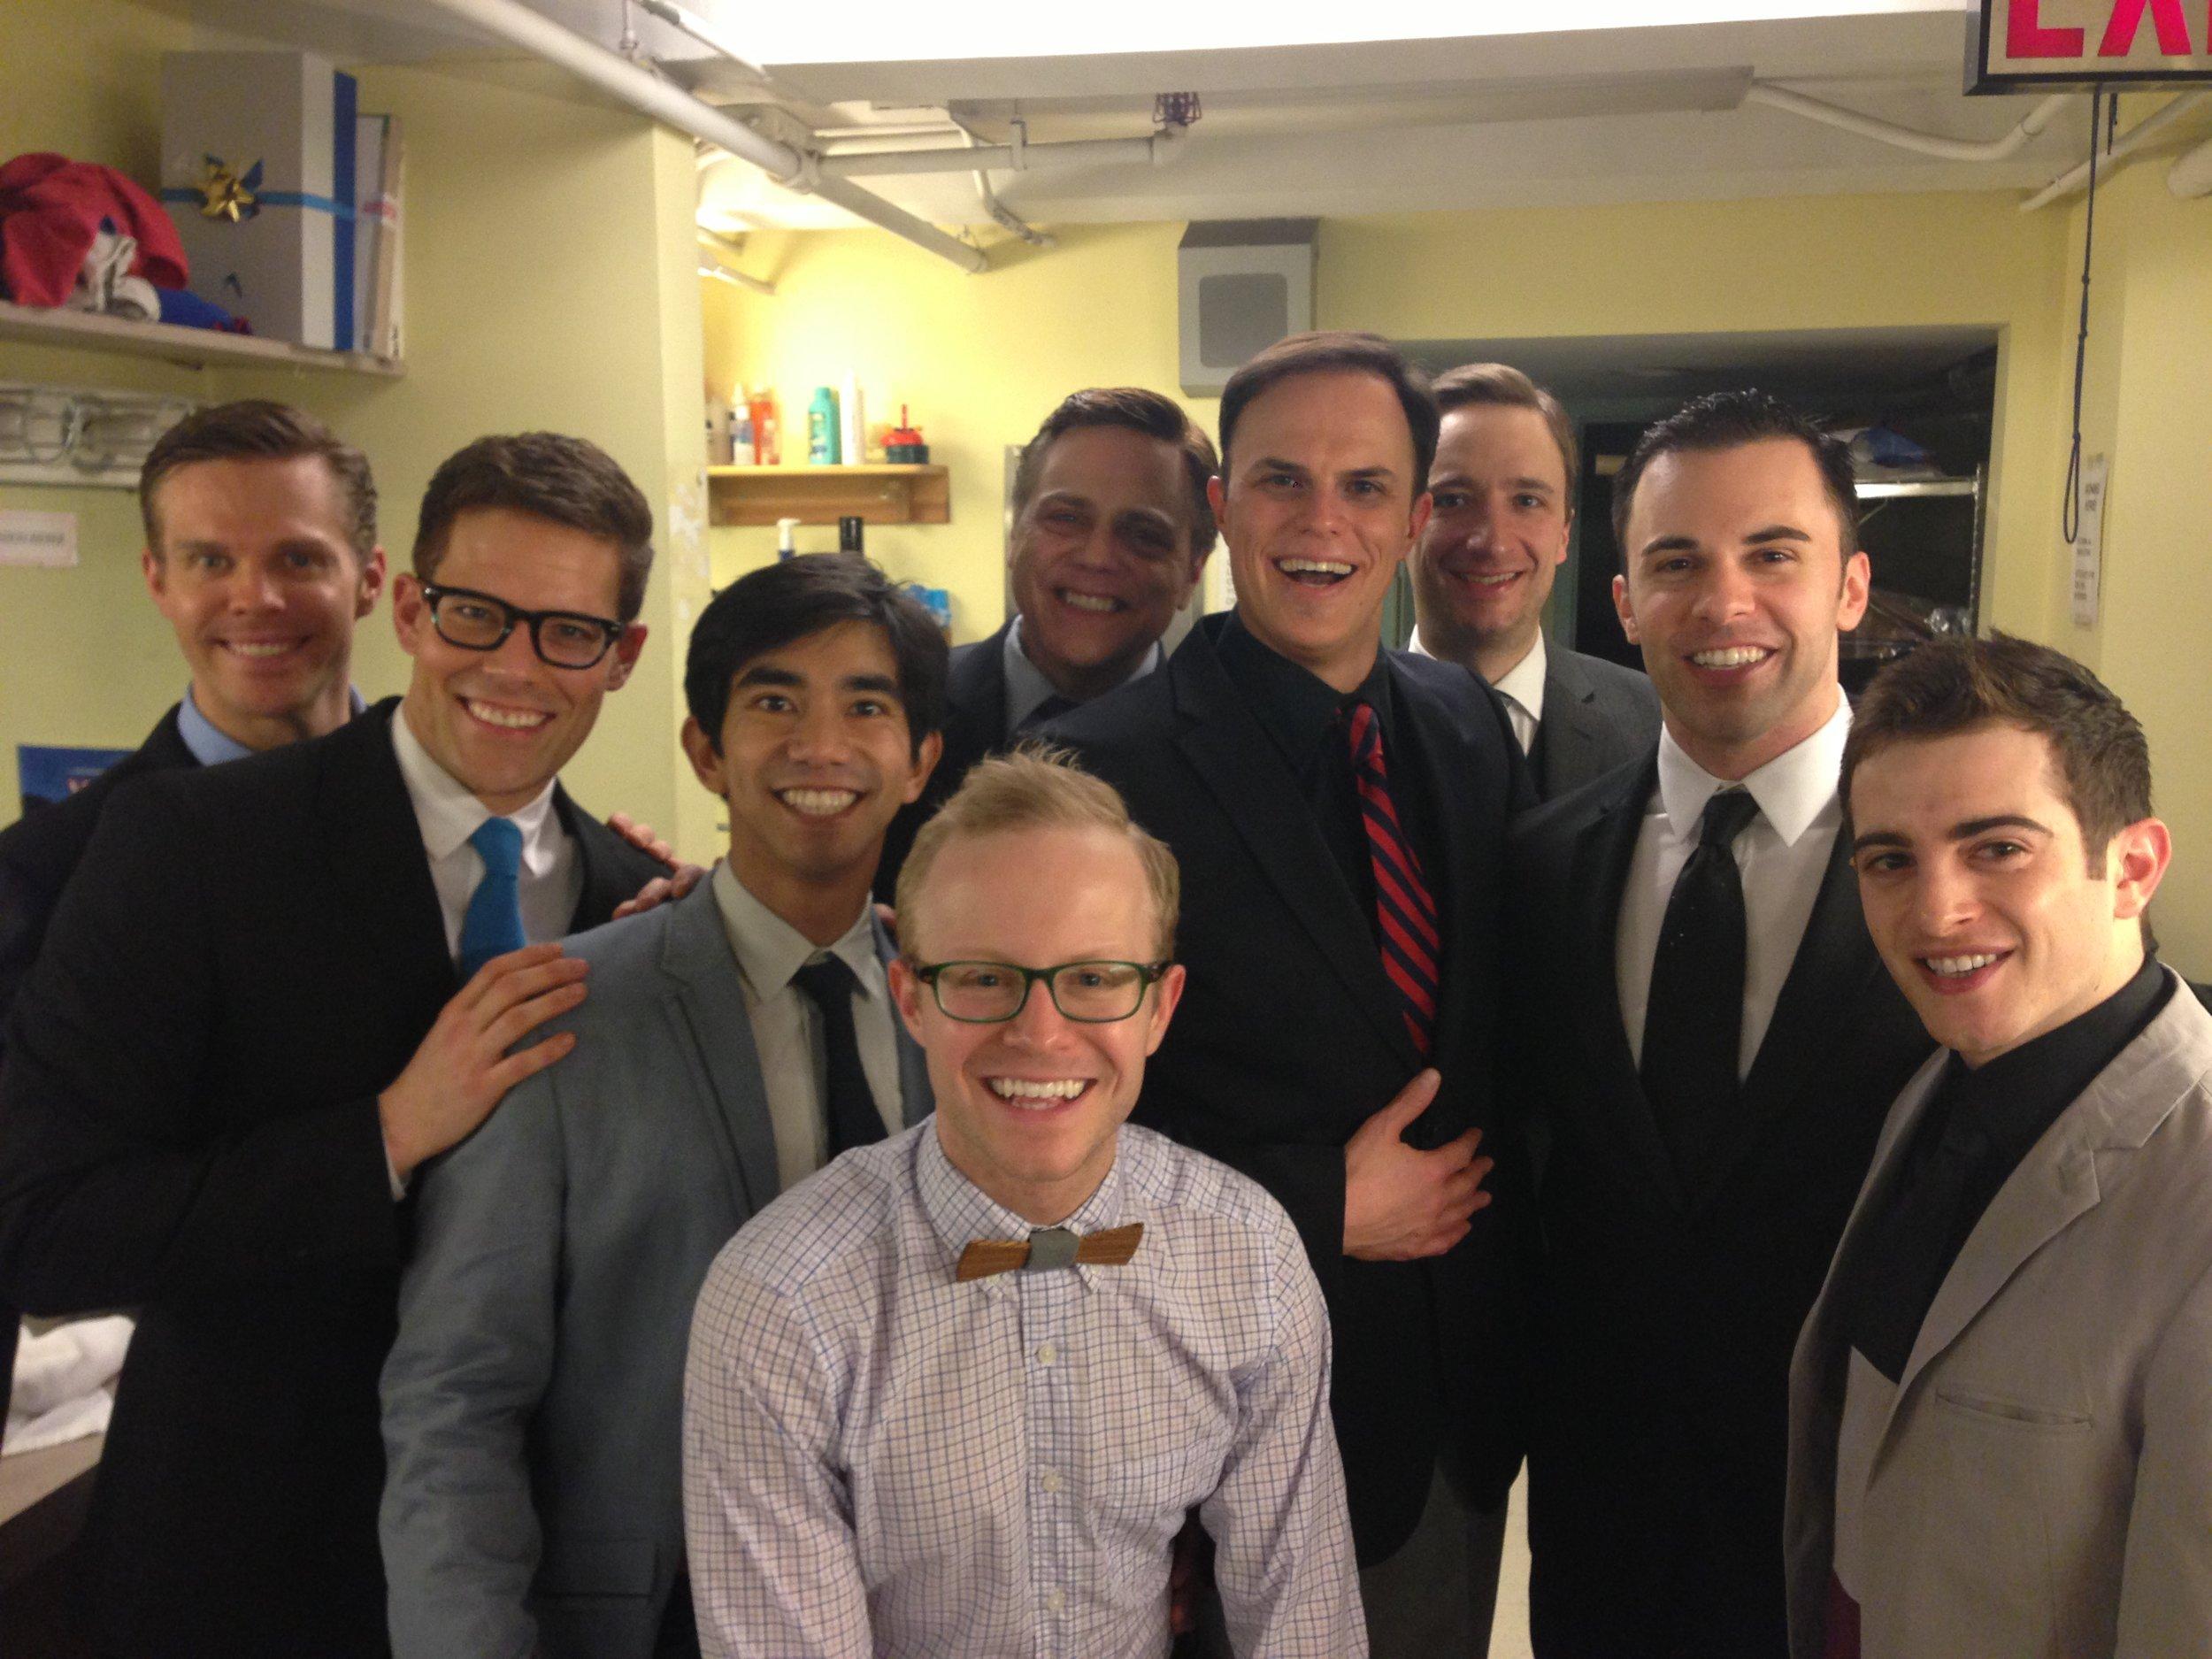 Our fabulous, hard-working men's ensemble. Left to right: myself, Brandon Bieber, Aaron J. Albano, Barrett Davis, Tom Souhrada, Corey Skaggs, Chuck Rea, James Tabeek, and Josh Assor.